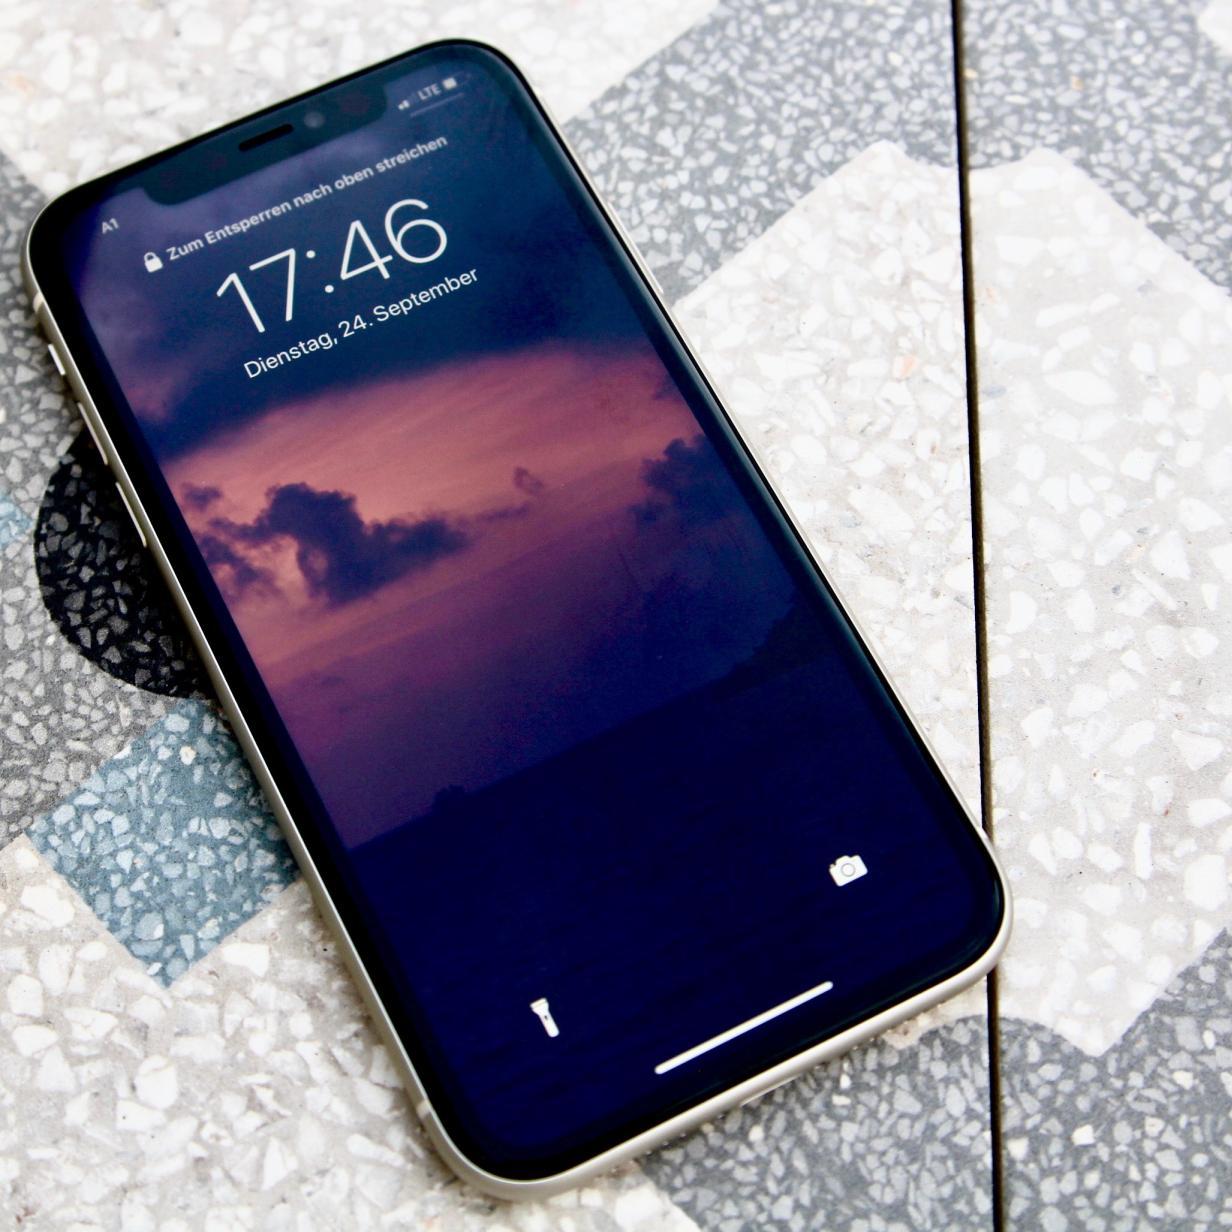 Apple plant kleines iPhone 12 mit OLED-Display